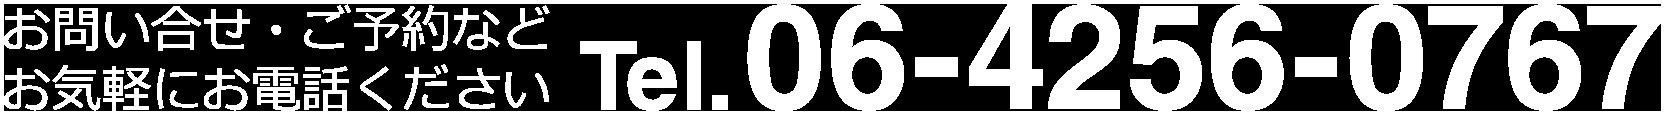 06-4256-0767